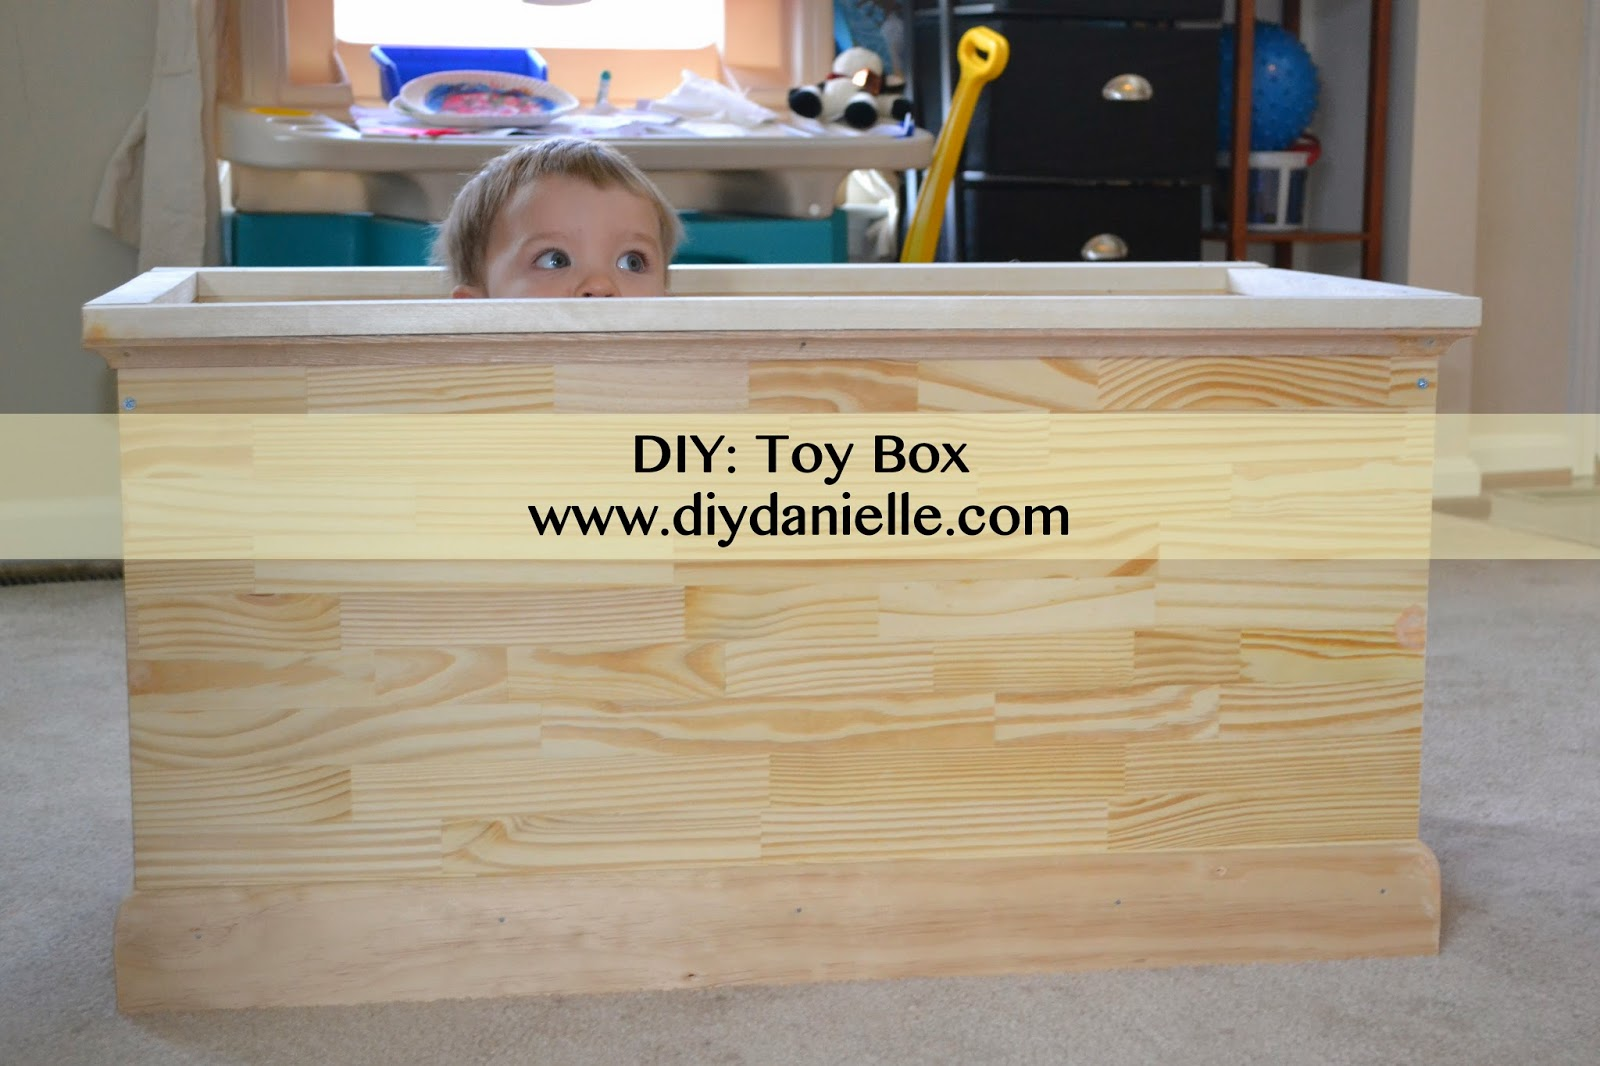 DIY make your own toy box plans Blueprints